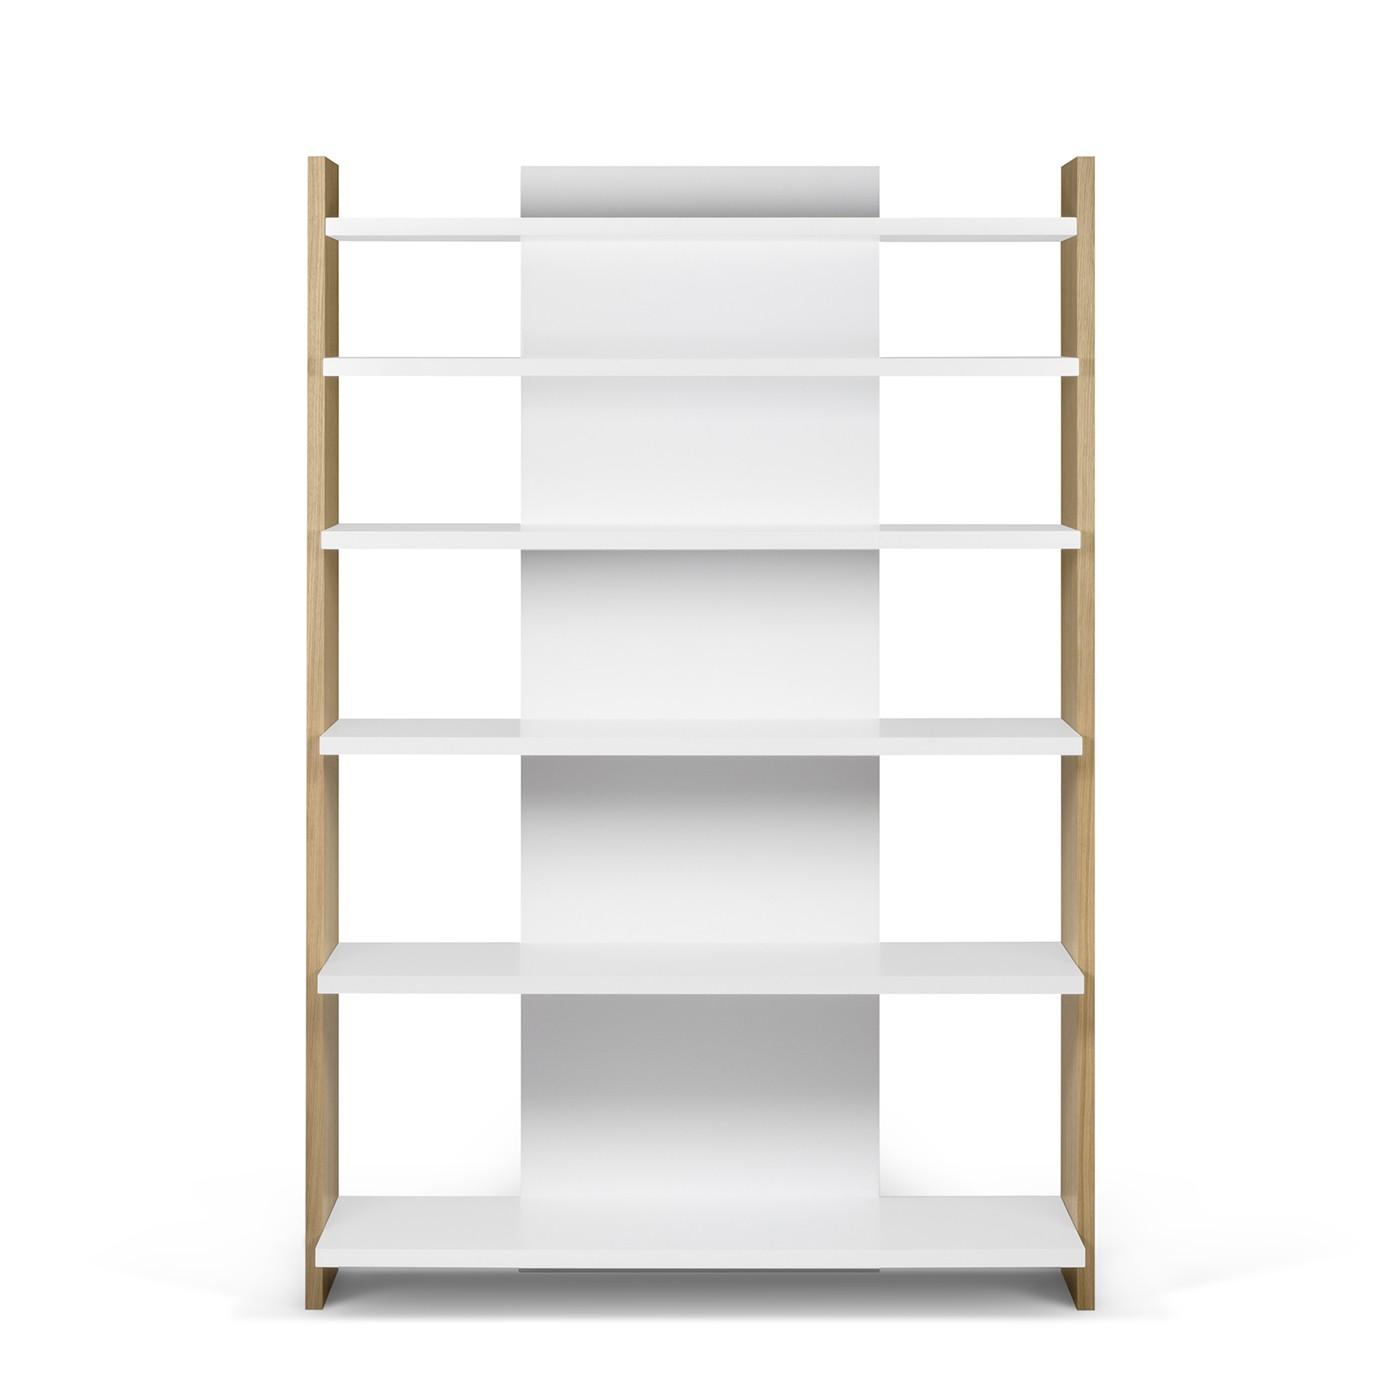 Tema home kasten boekenkasten - Moderne boekenkast ...